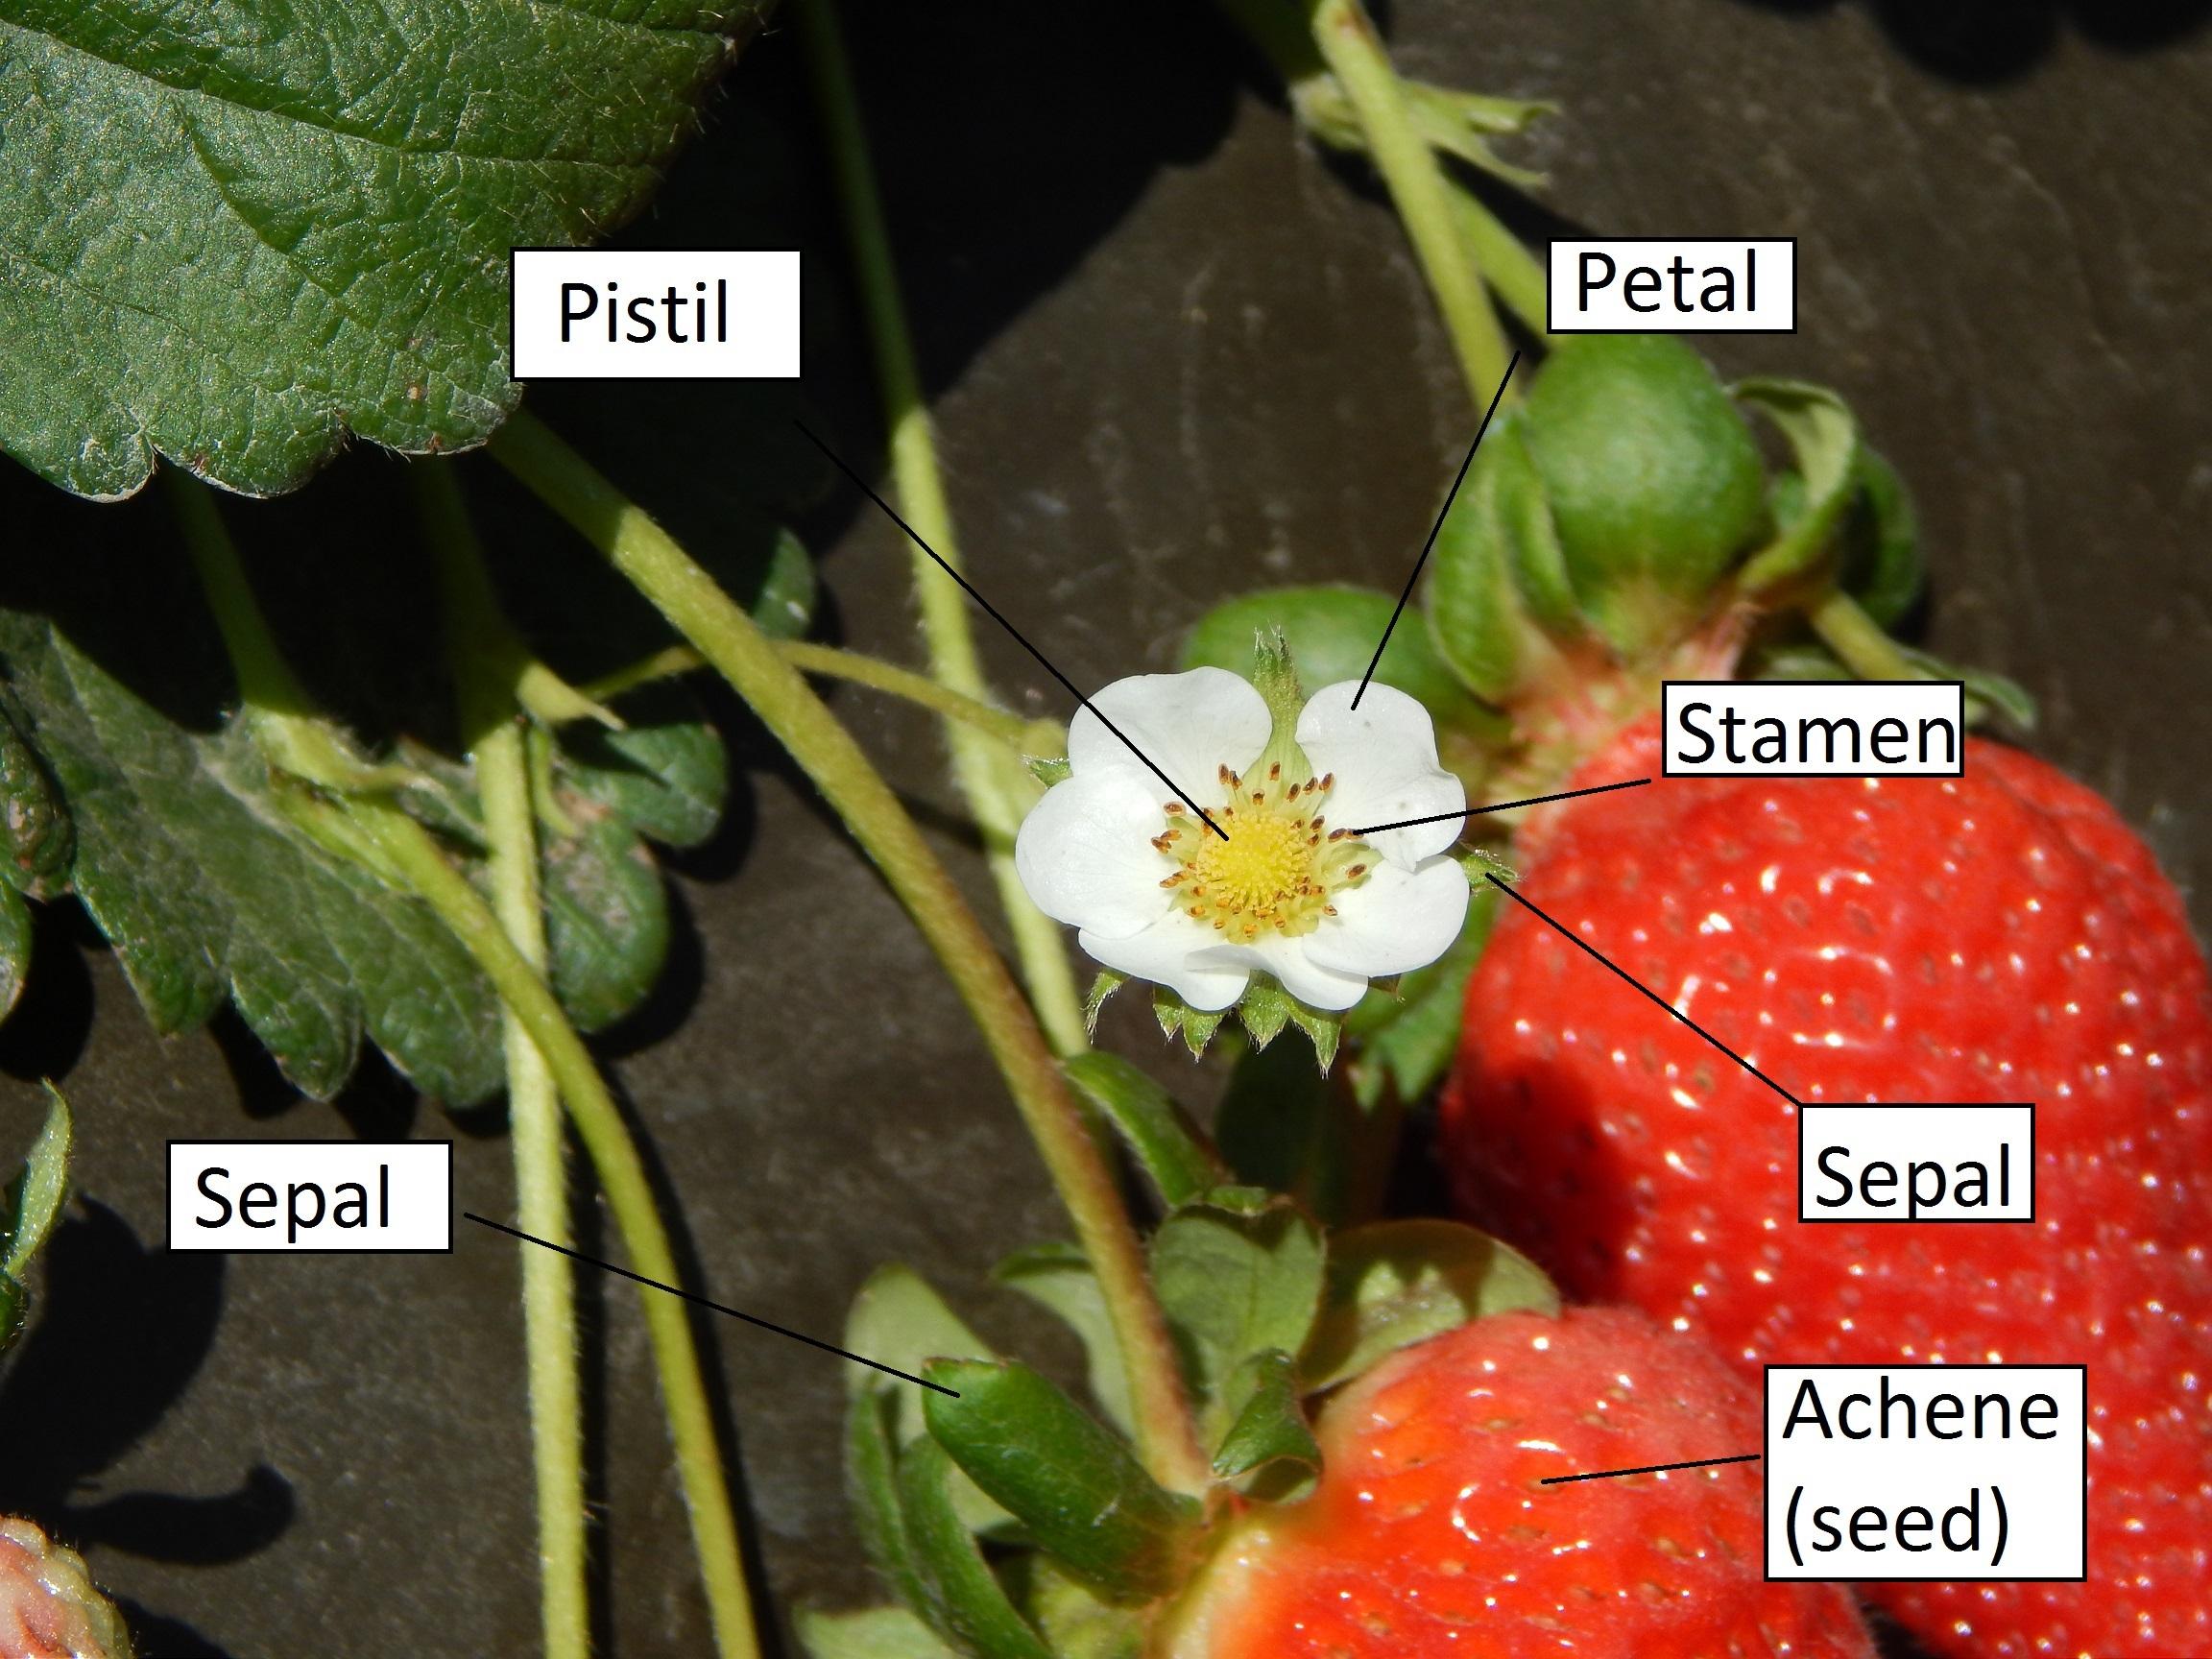 strawberry fruit diagram toyota land cruiser prado 120 wiring strawberries 101 darensberries  santa maria